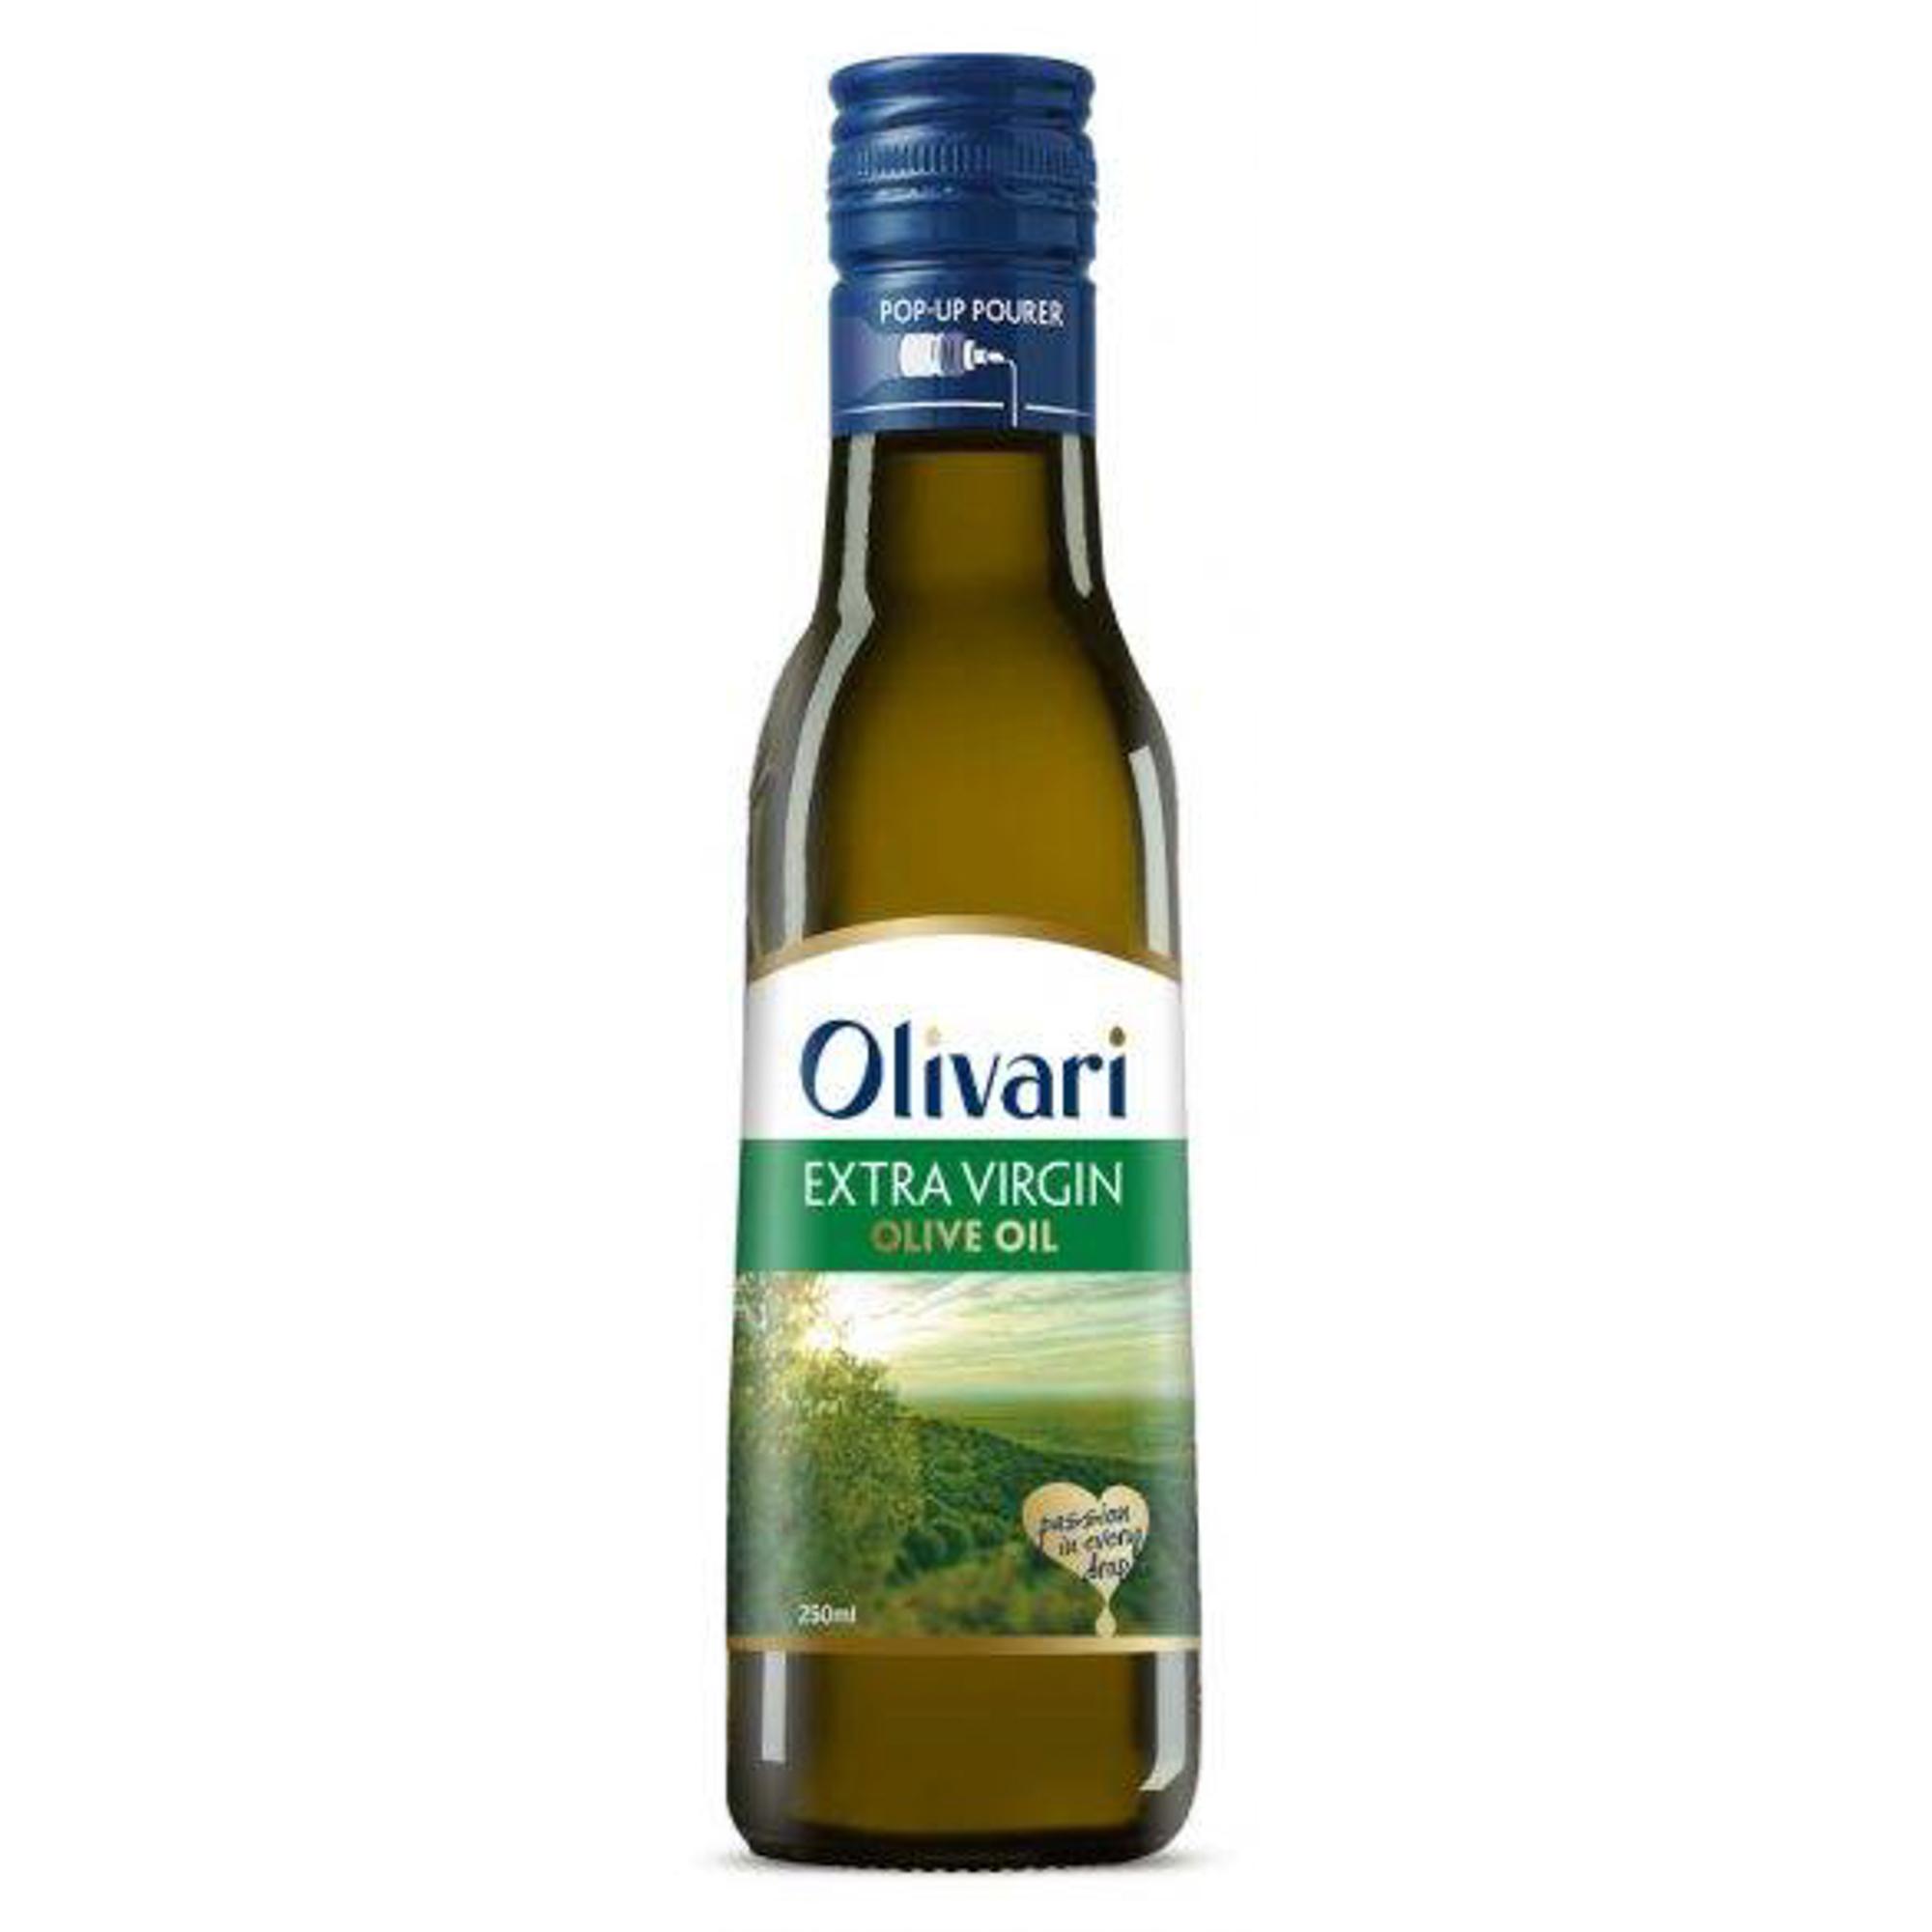 Масло оливковое Olivari Extra Virgin 250 мл korvel оливковое масло extra virgin греция данае 250 мл